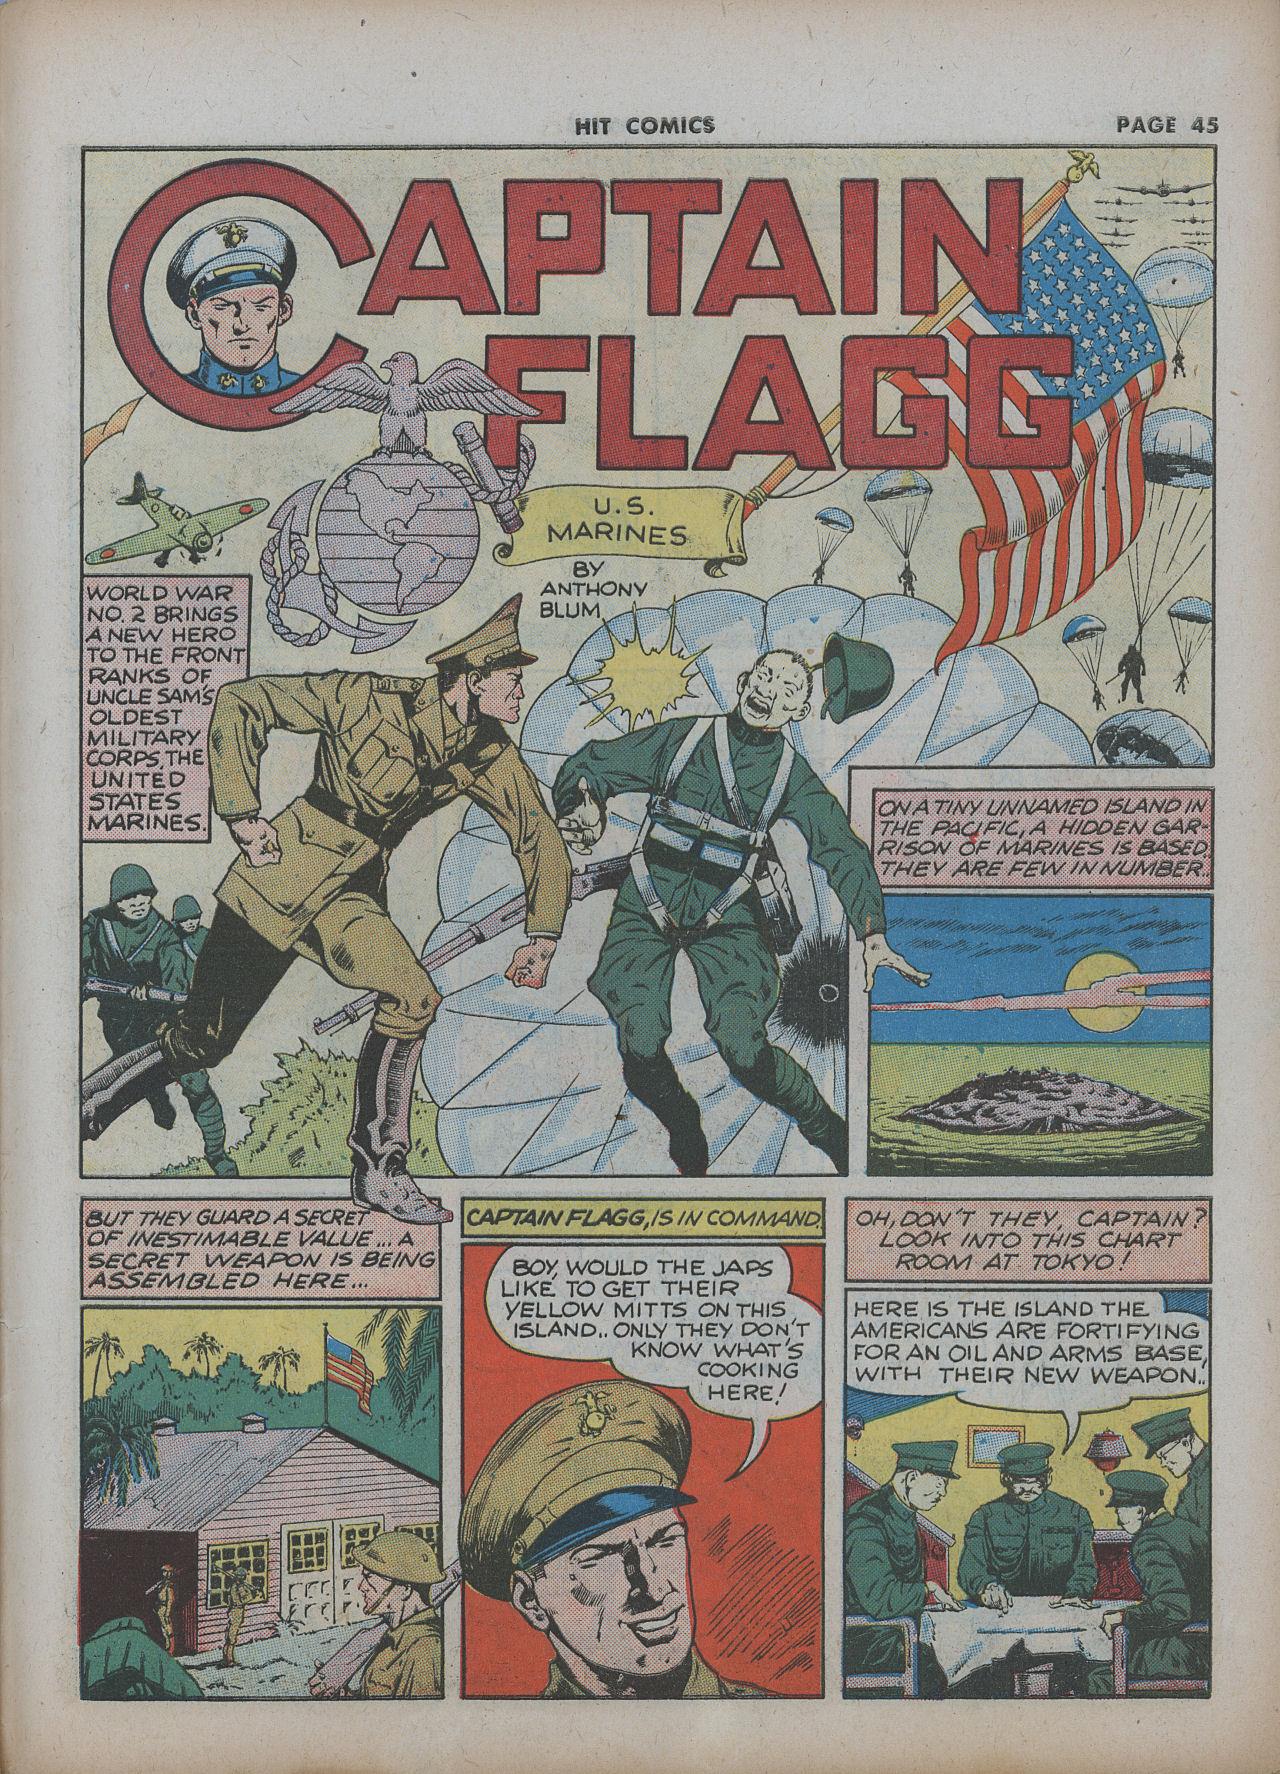 Read online Hit Comics comic -  Issue #22 - 47